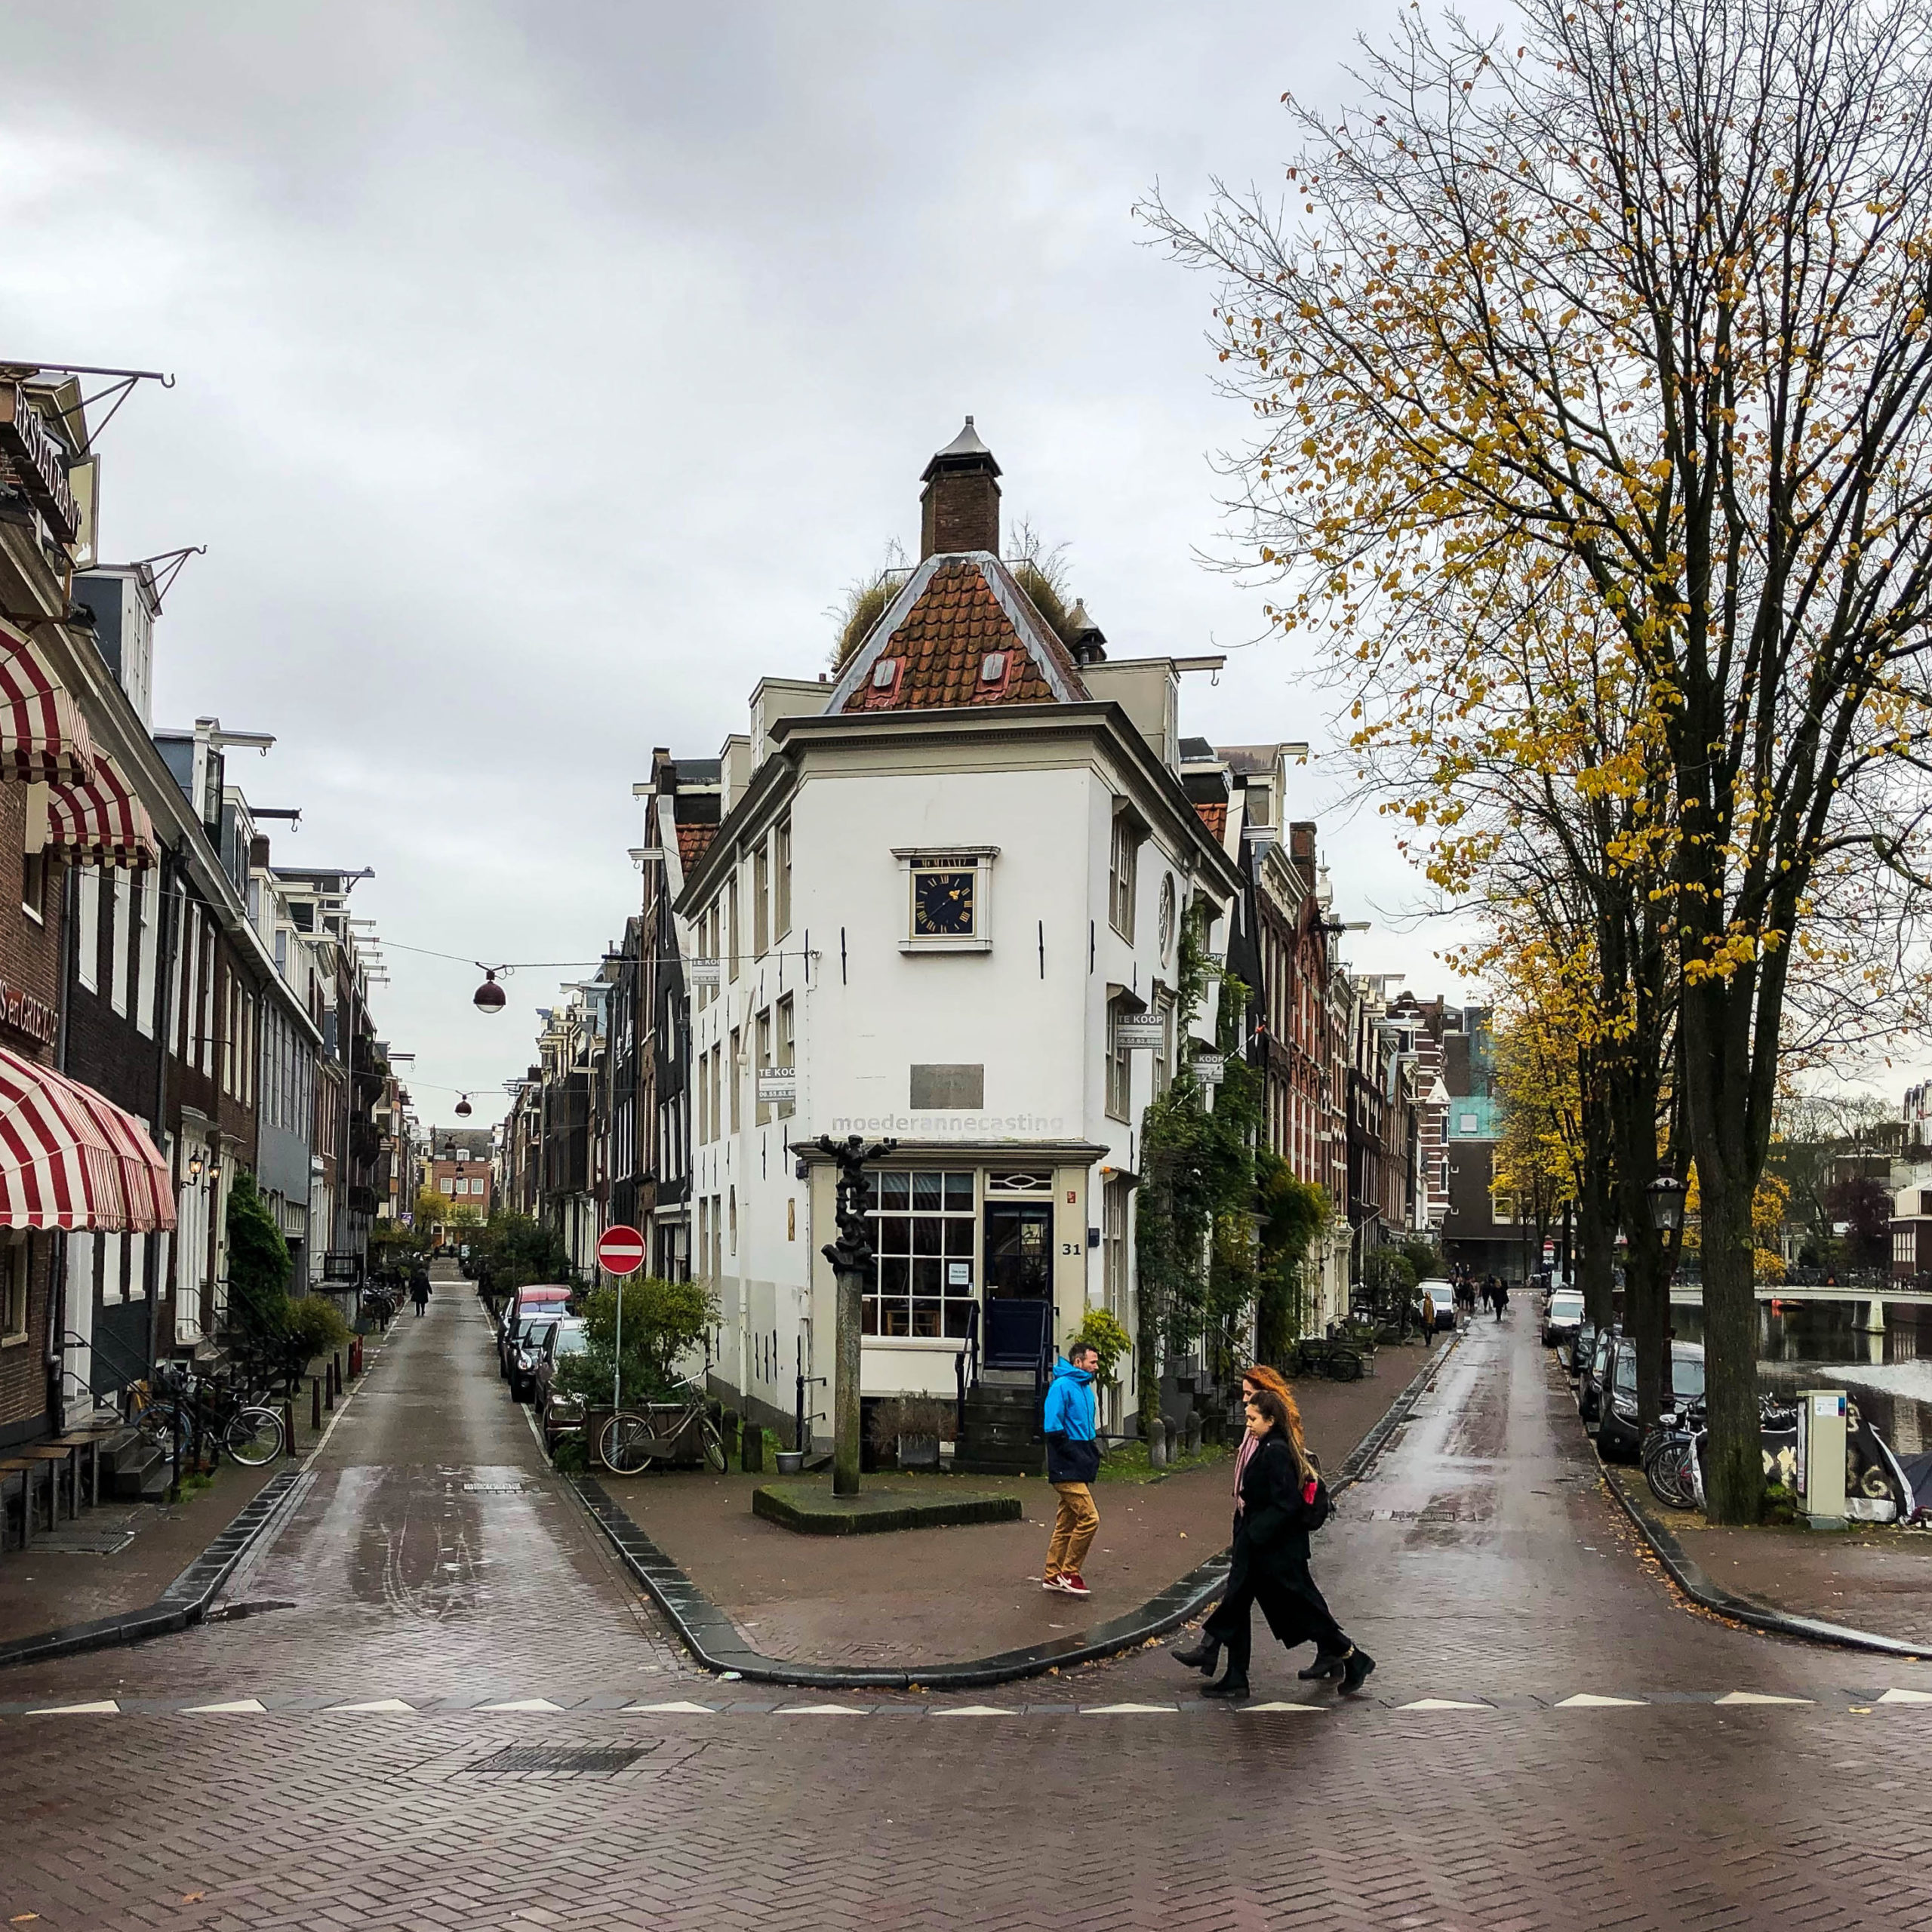 Amsterdam travel guide, www.roadsanddestinations.com